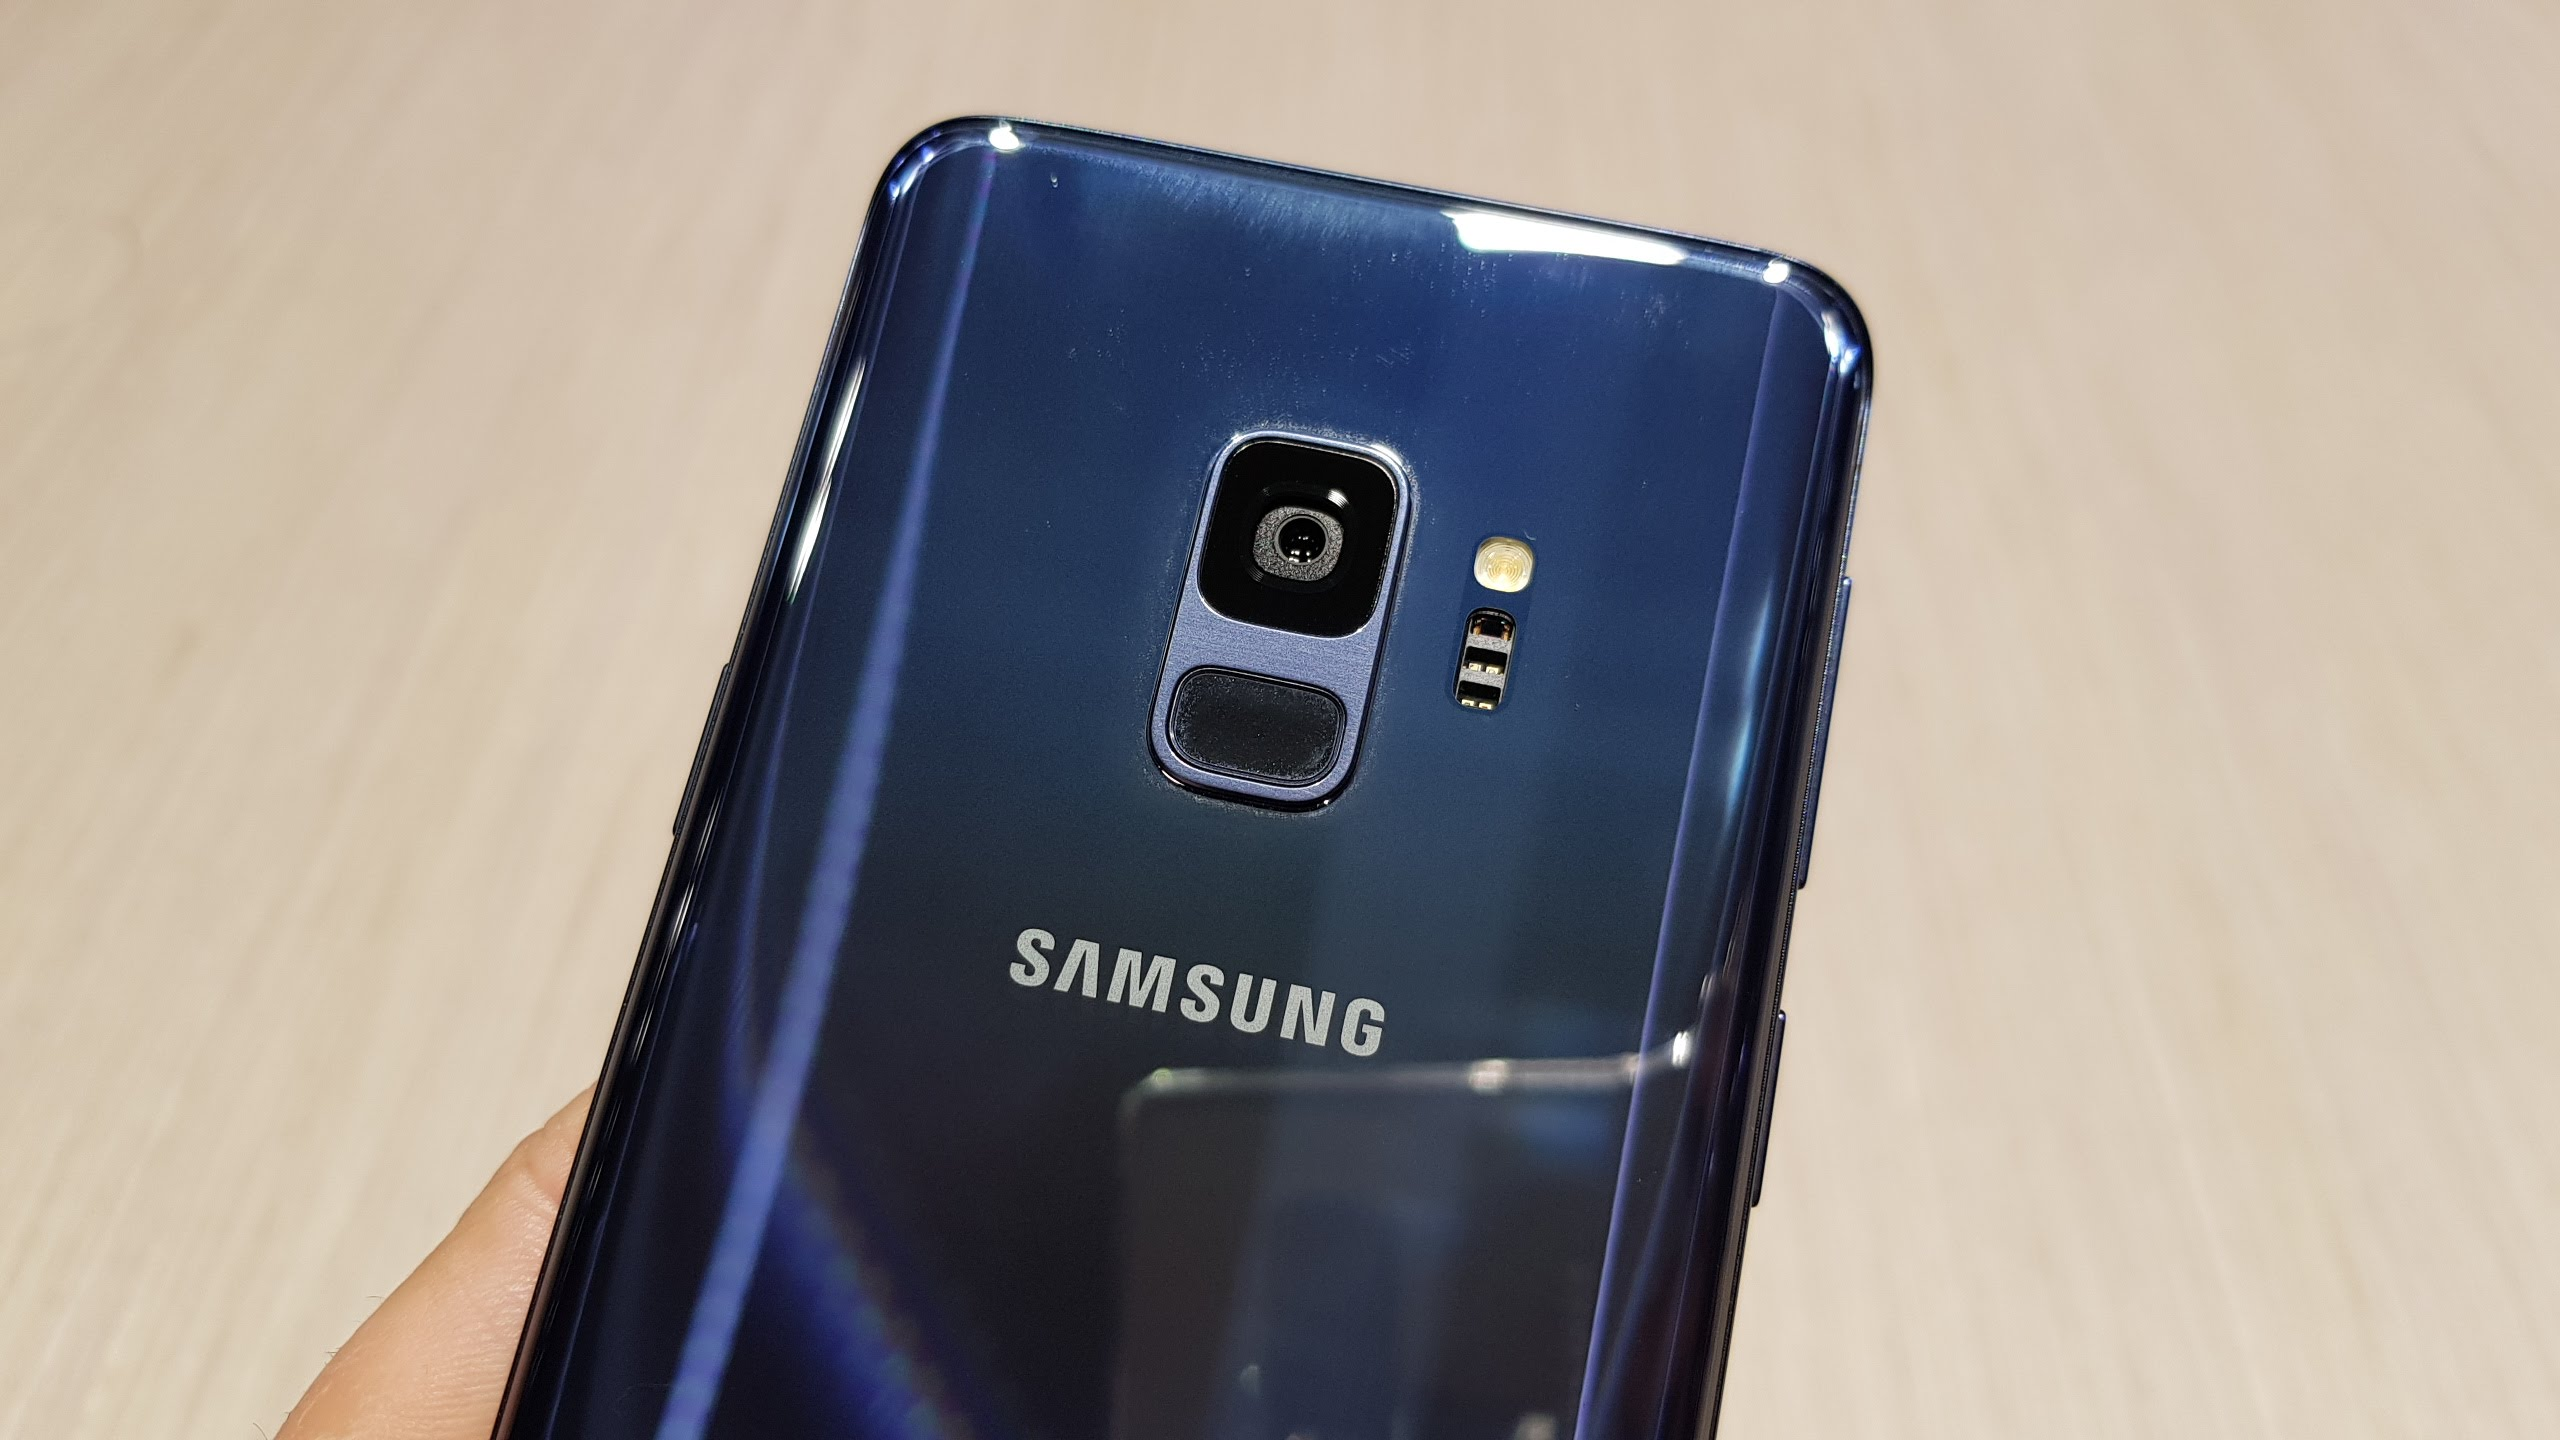 Galaxy S9 / S9+ 的雙光圈到底有什麼差別? 實拍給你看 20180225_194457